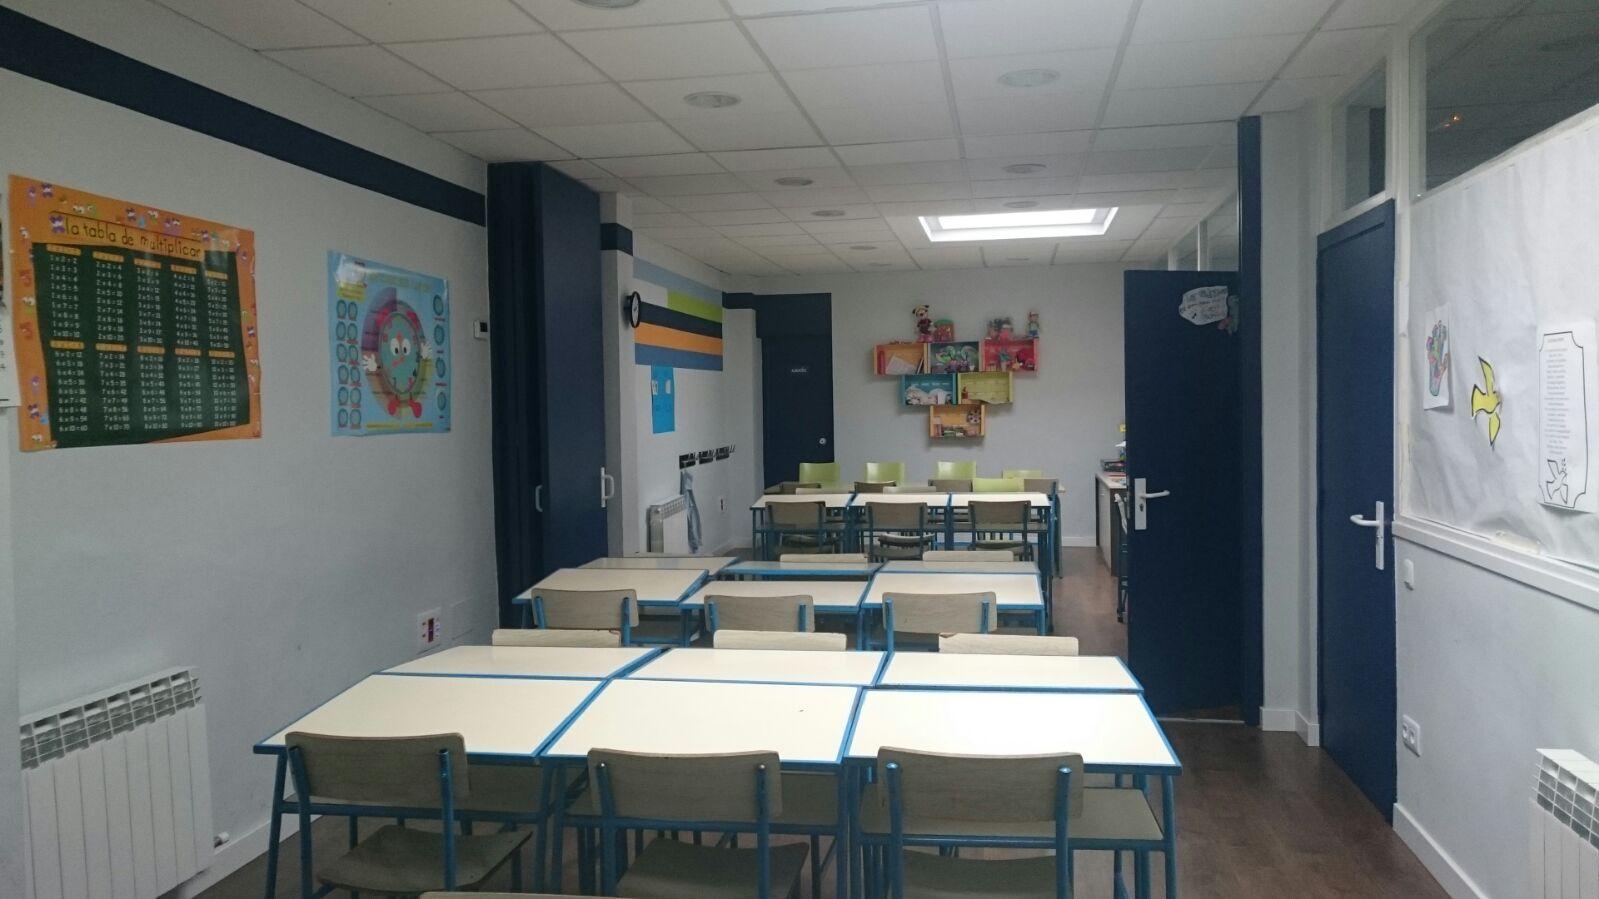 instalacionesFundacionAsvai_13